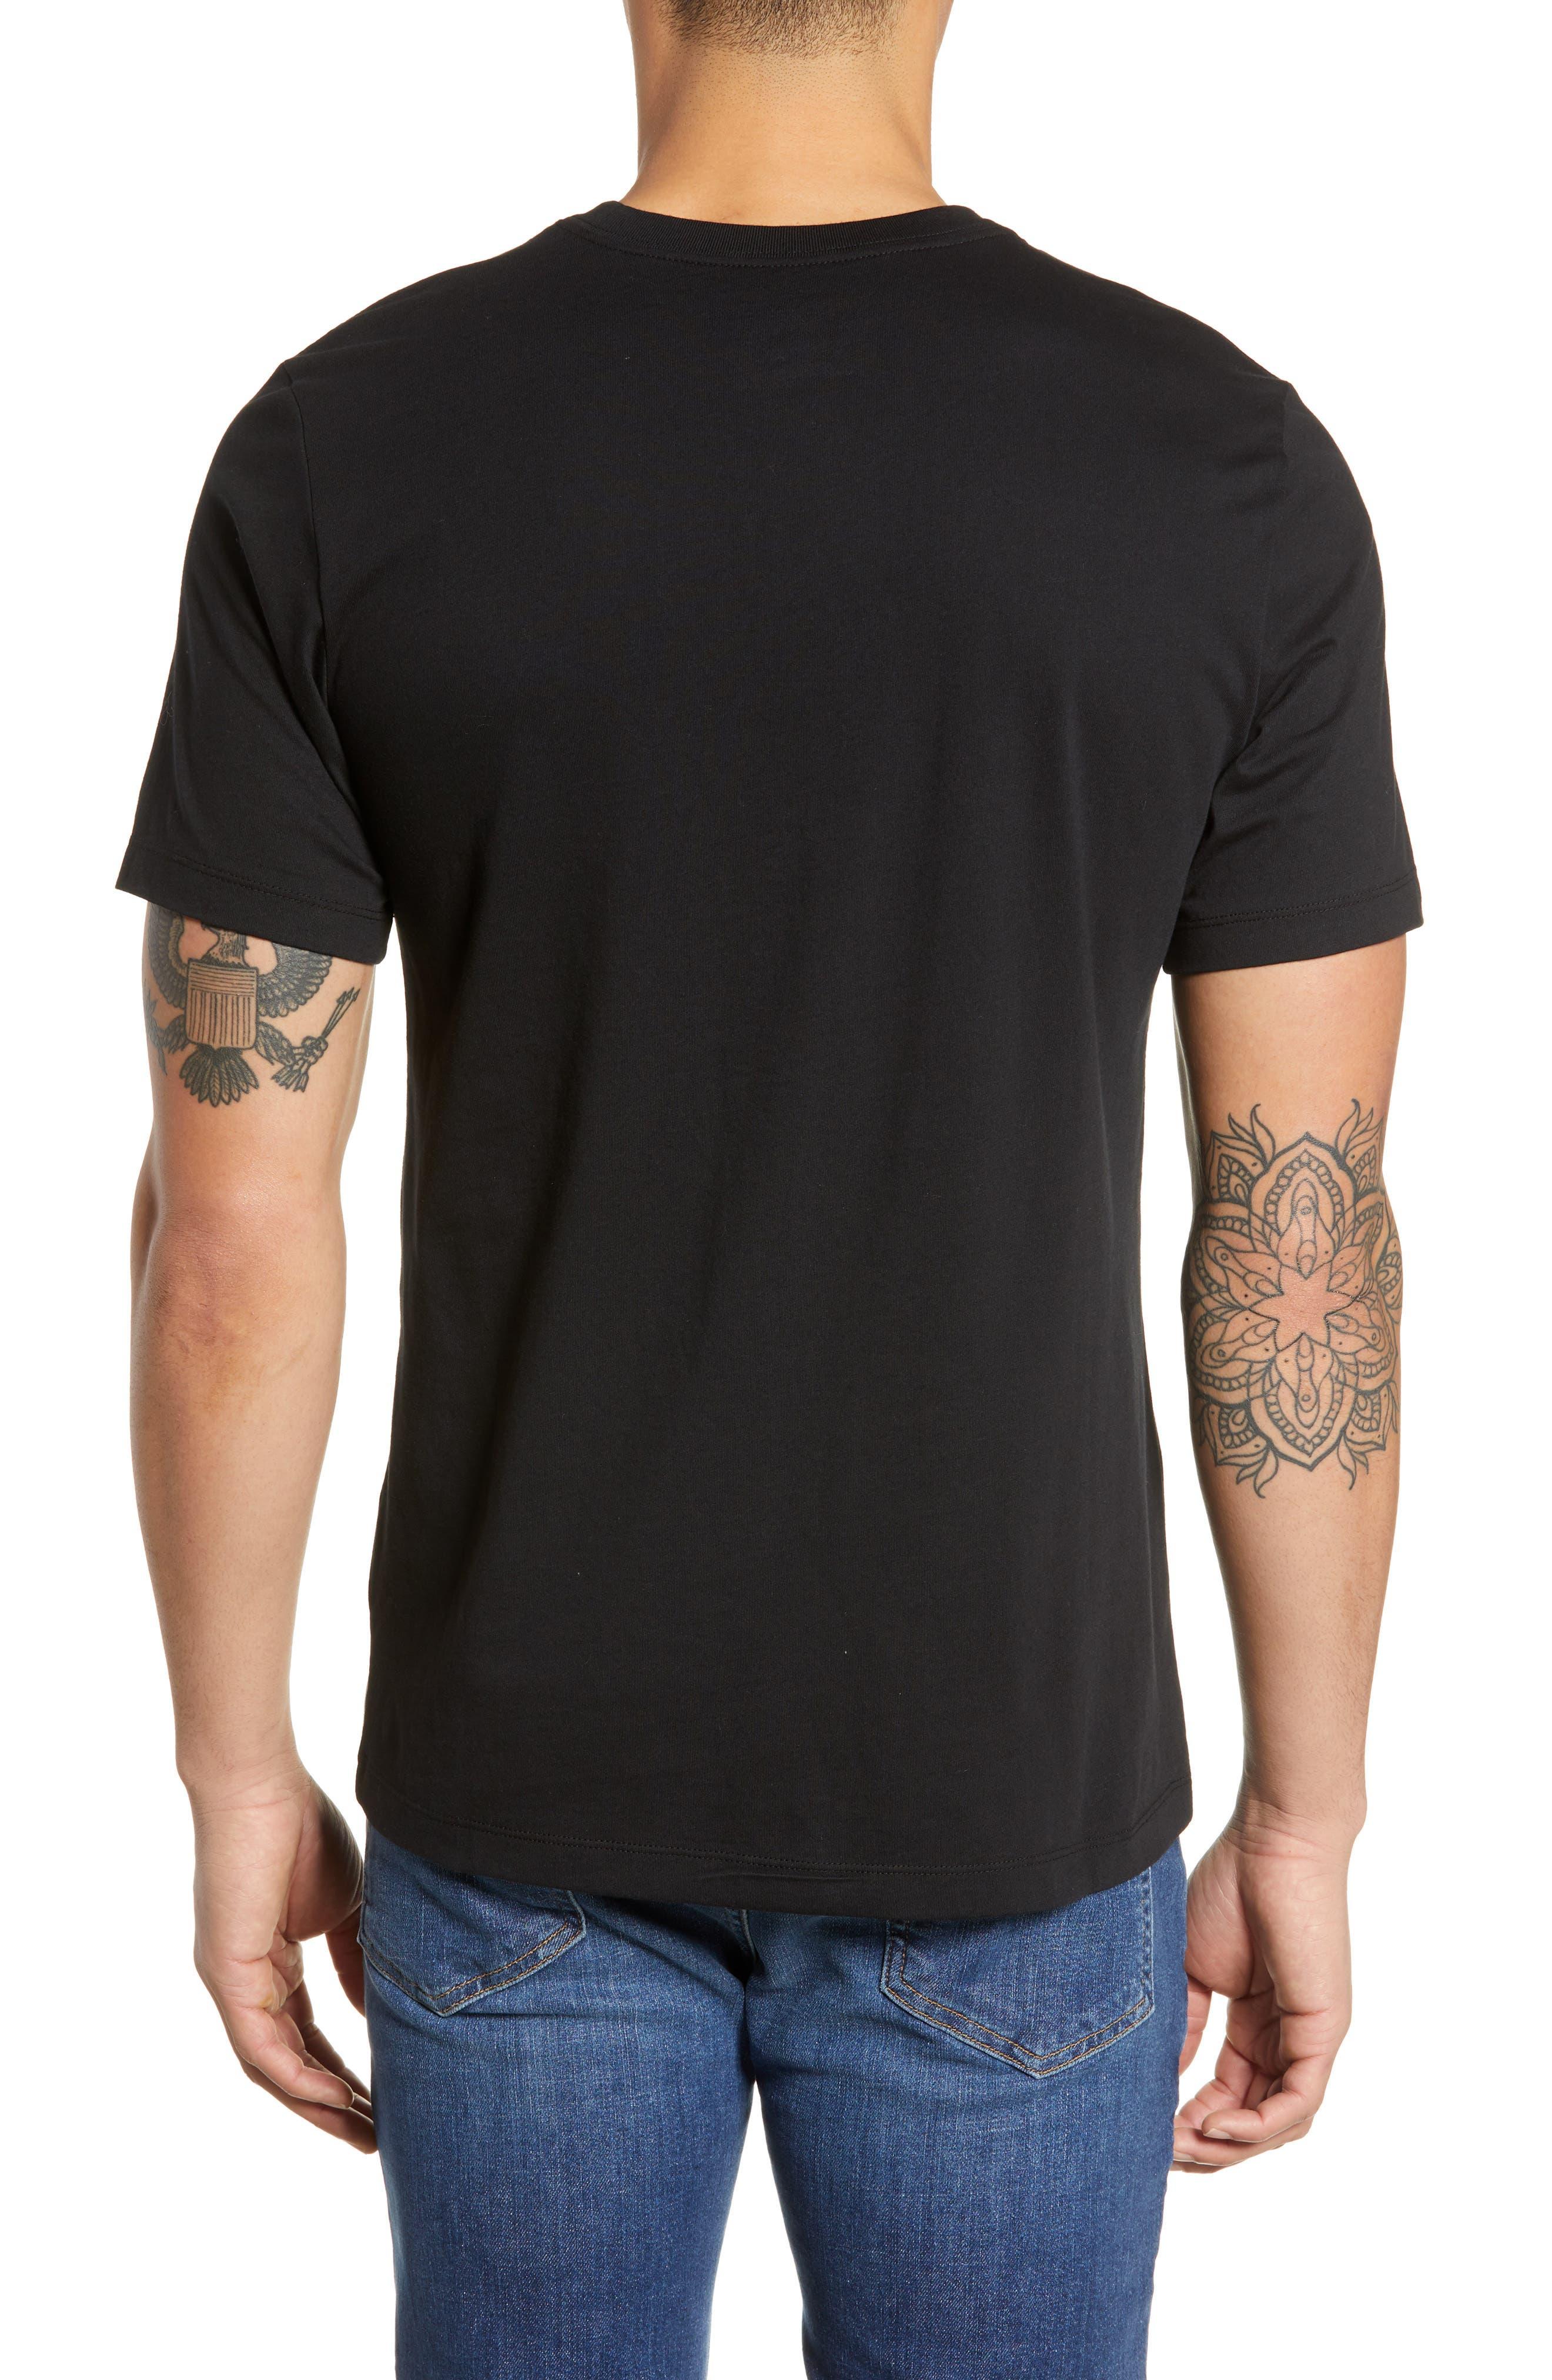 Air Force 1 T-Shirt,                             Alternate thumbnail 2, color,                             BLACK